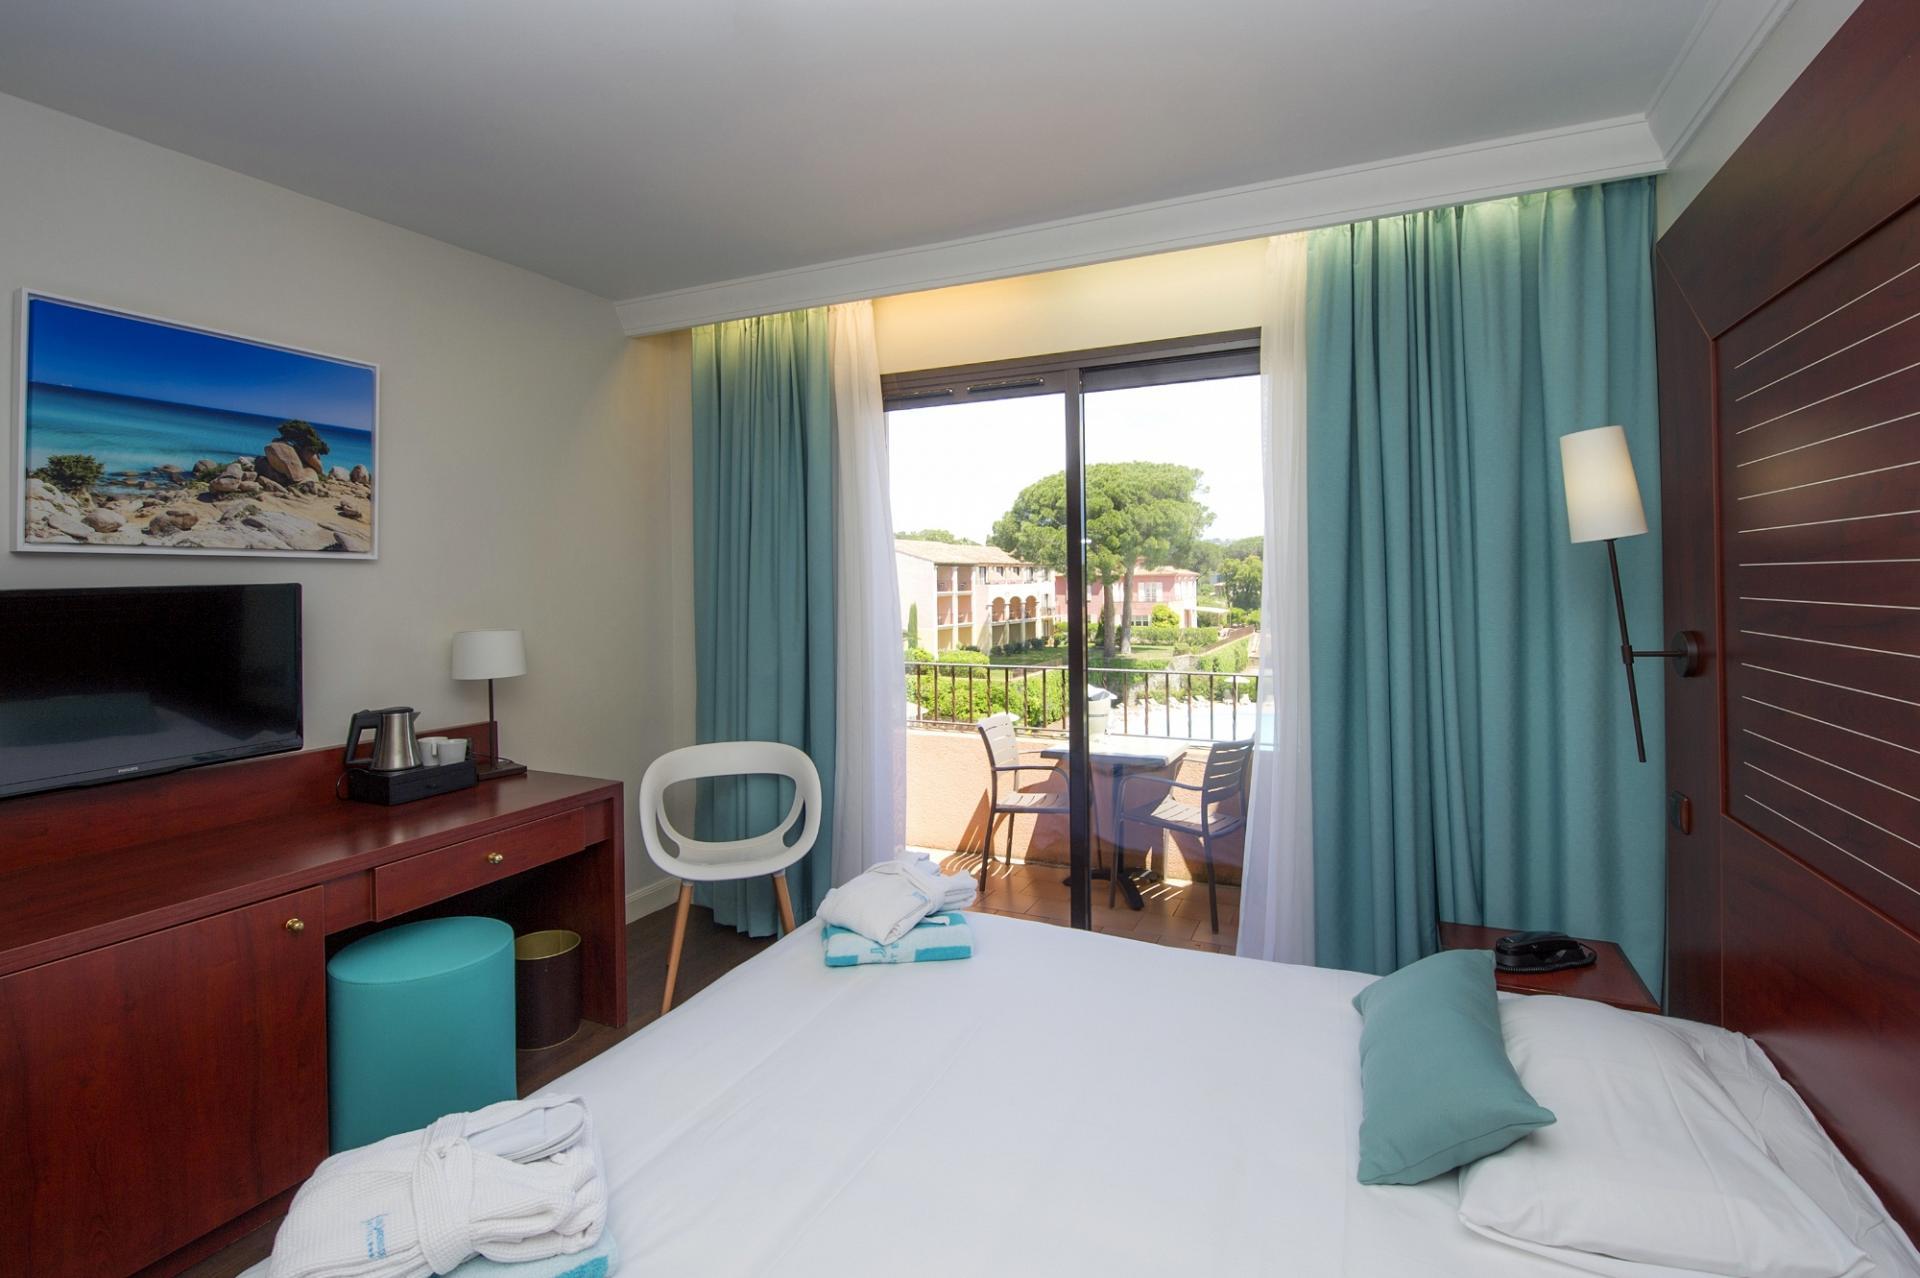 Stay At Hotel Les Jardins De Sainte-Maxime destiné Hotel Les Jardins De Sainte Maxime